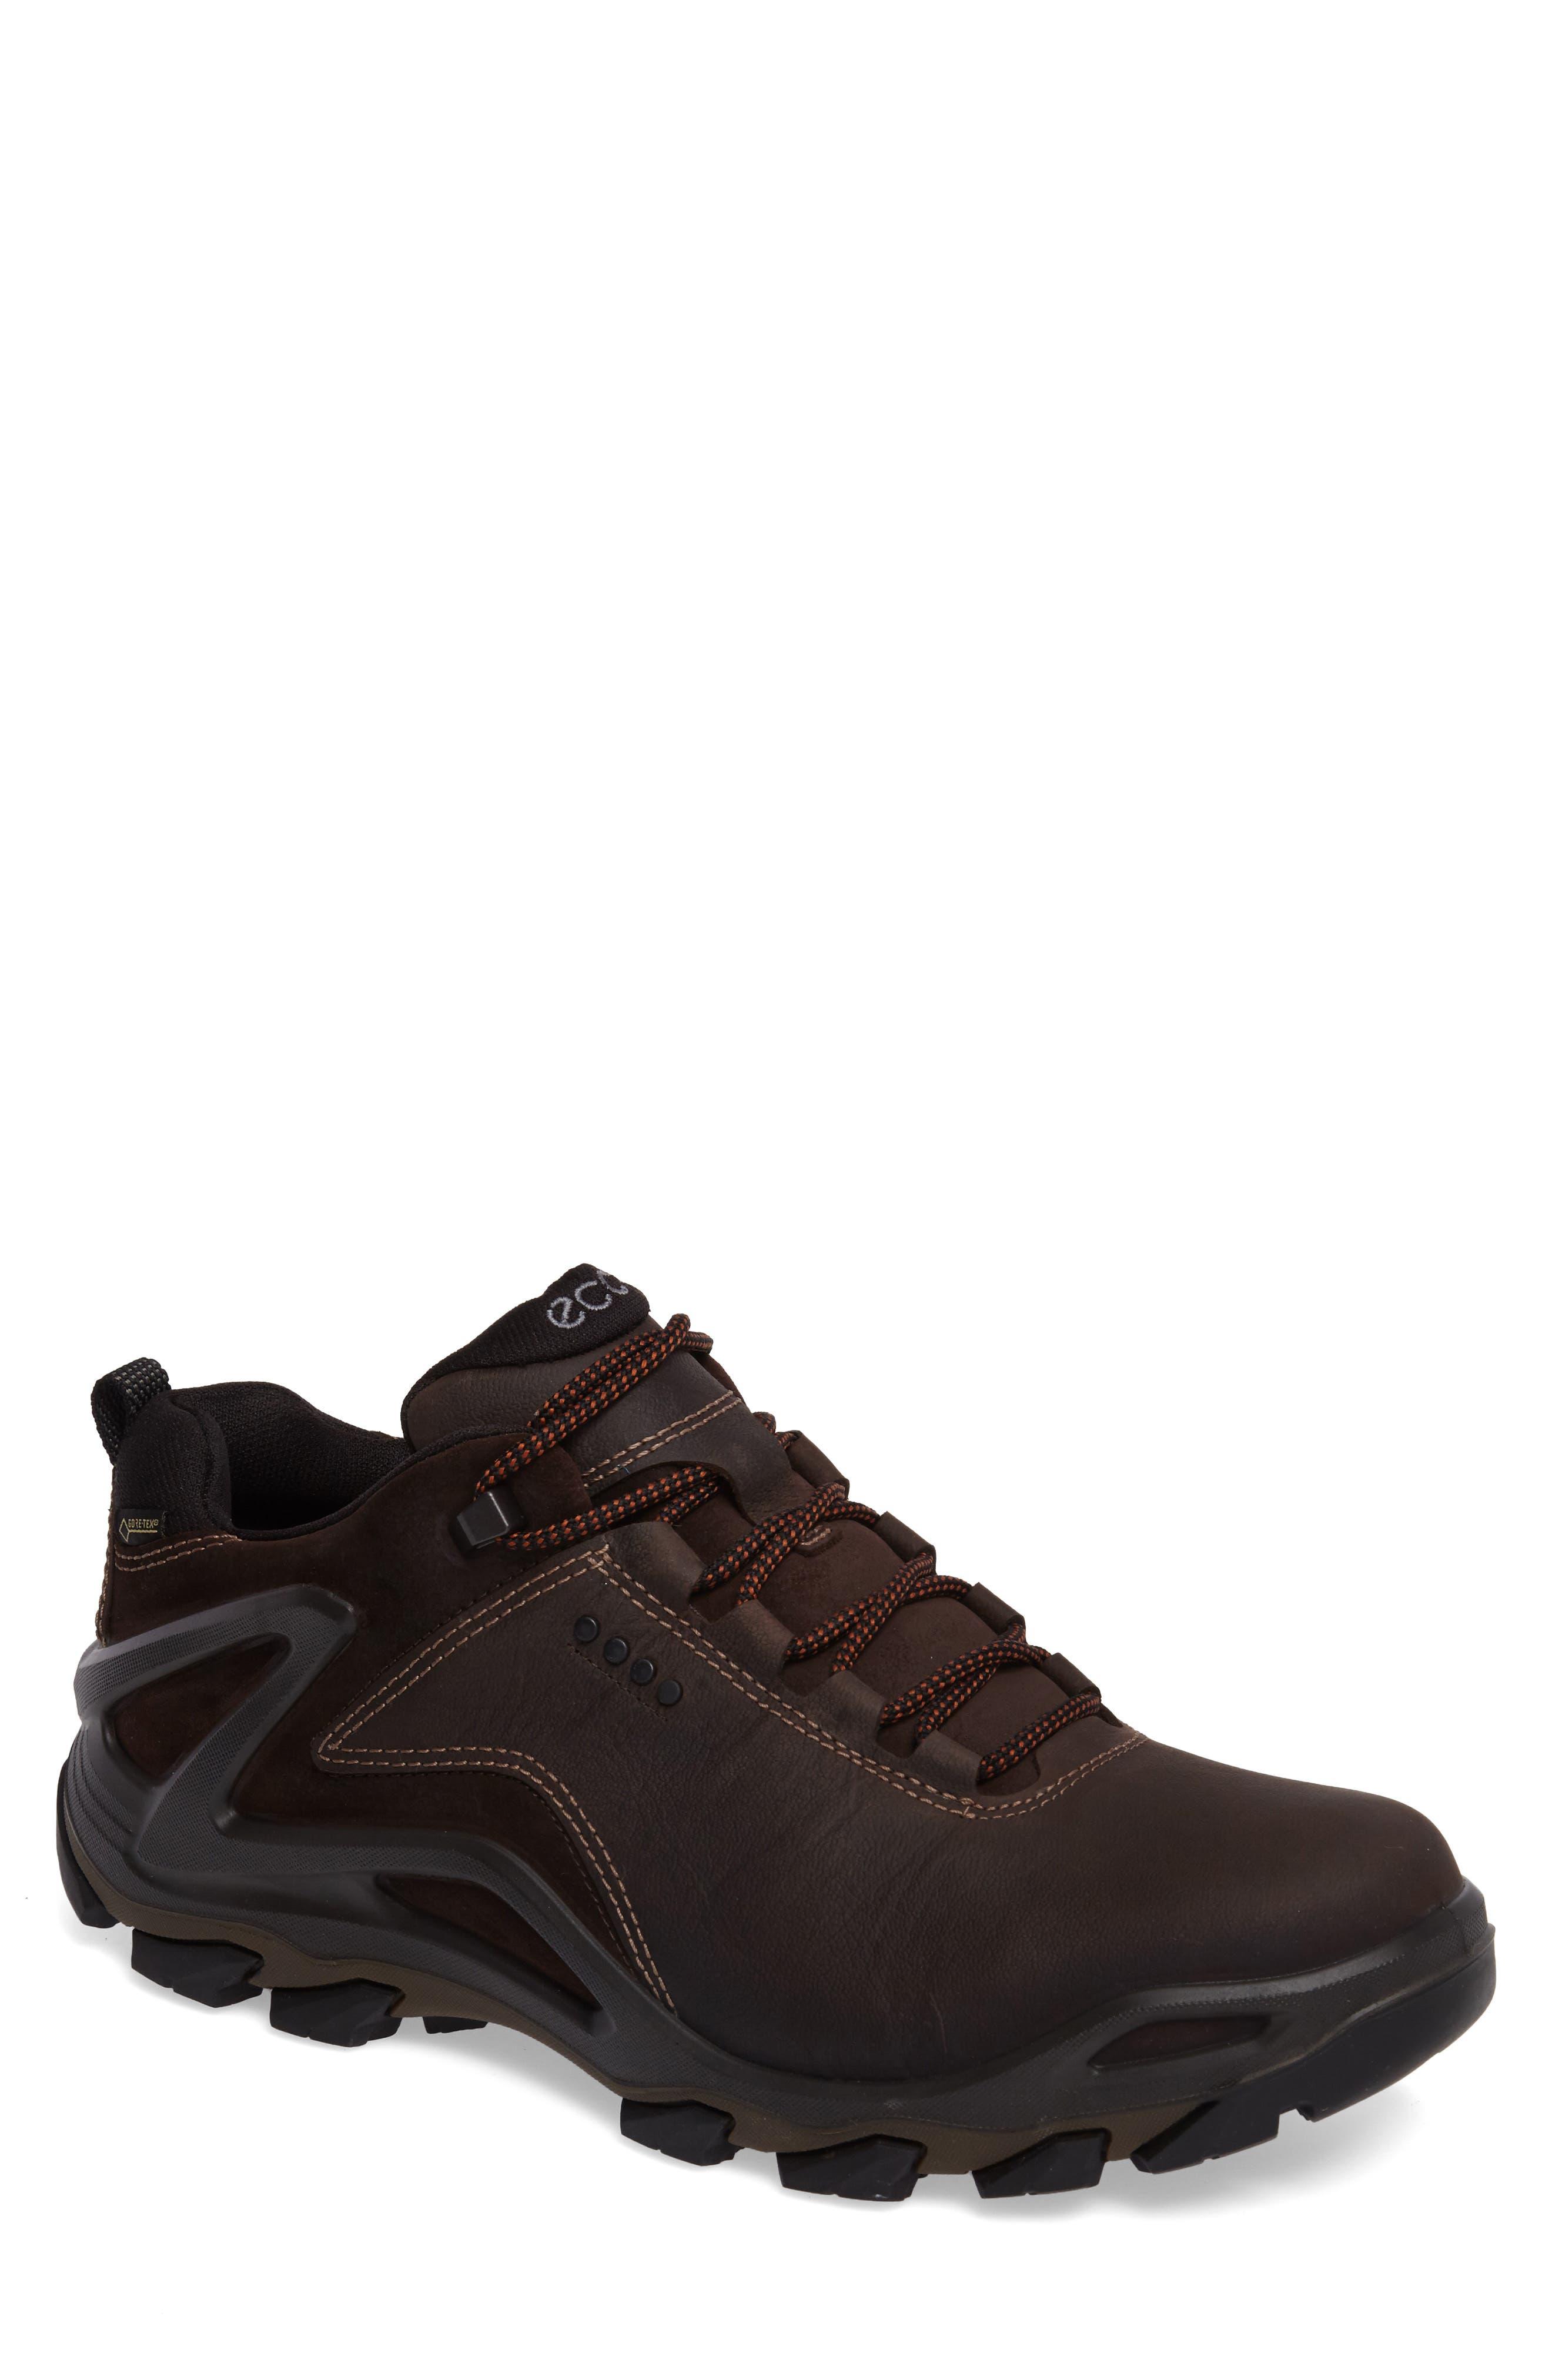 ECCO Terra Evo GTX Low Hiking Shoe (Men)